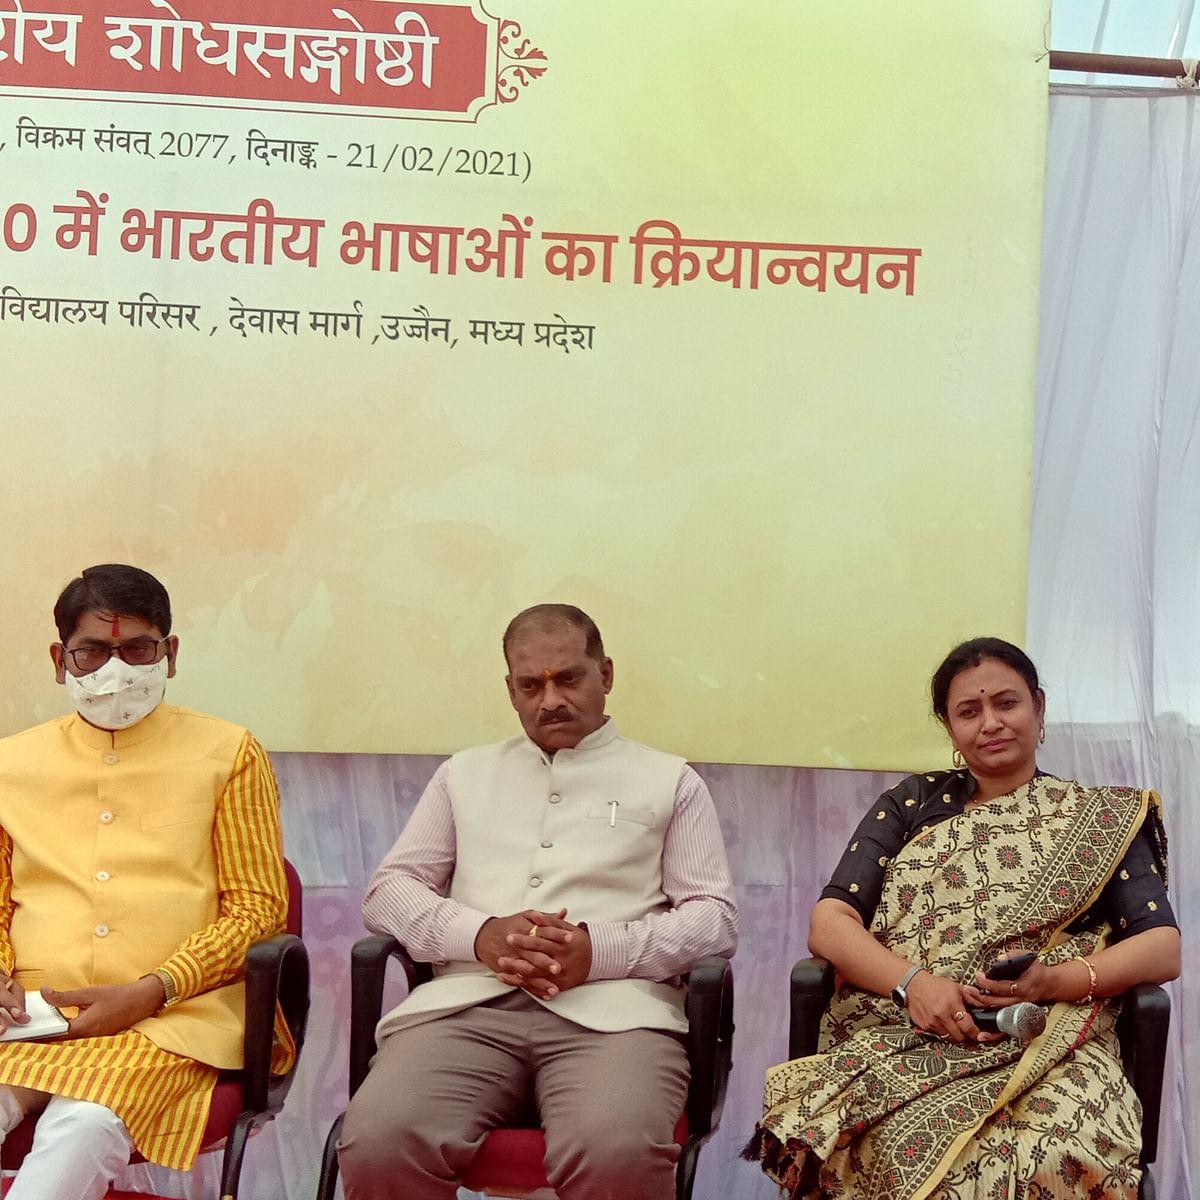 Ujjain: Disappearance of language is disappearance of culture, says national secretary of Shiksha Sanskriti Utthan Nyas